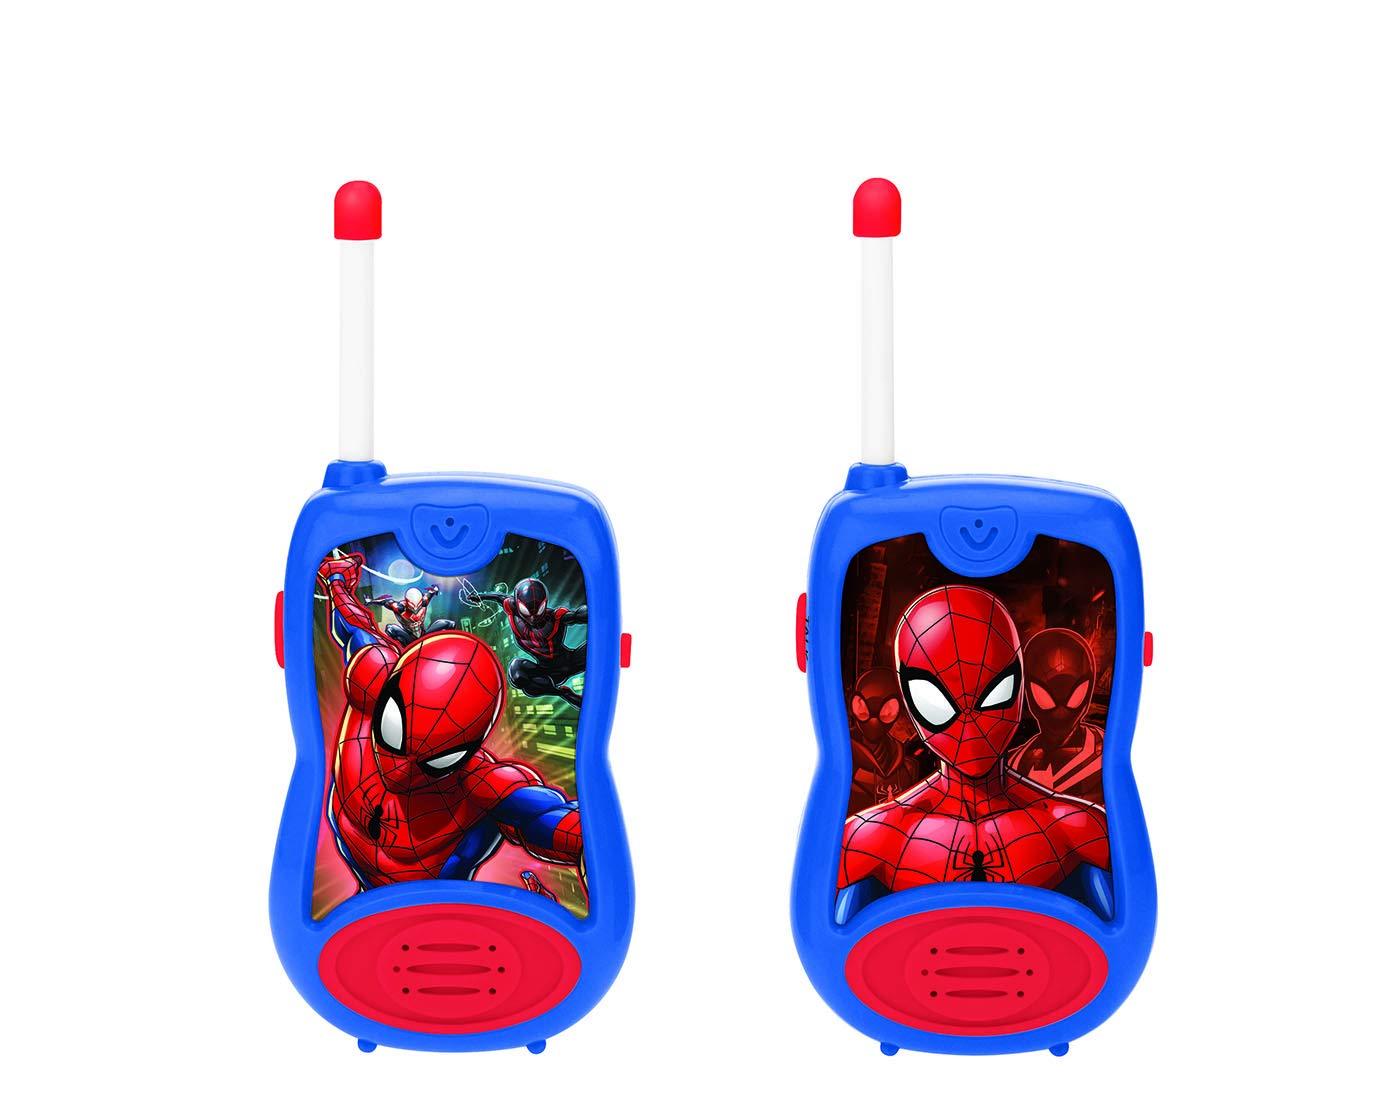 LEXIBOOK TW12SP Marvel Spider-man Spiderman Walkie-Talkies, Blue/Red